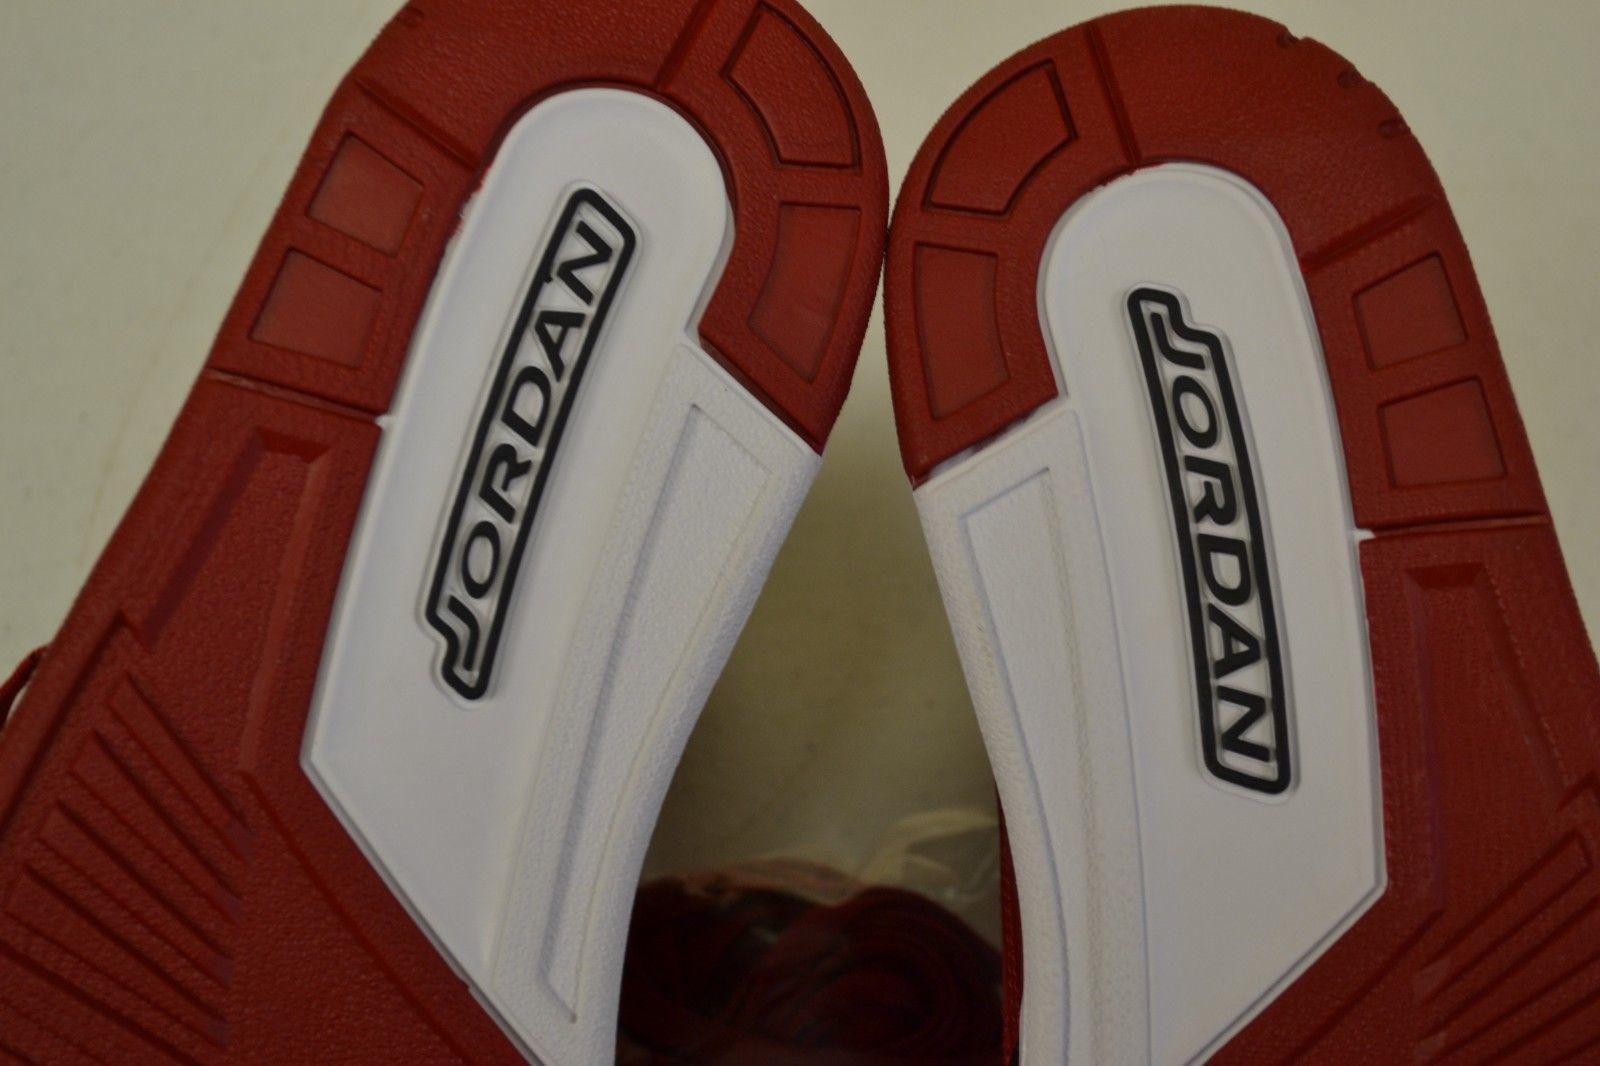 best loved 21461 16648 Nike Air Jordan Flight SC-3 Size Mens sz 11.5 Shoes 629877-601 Black. Next.  1